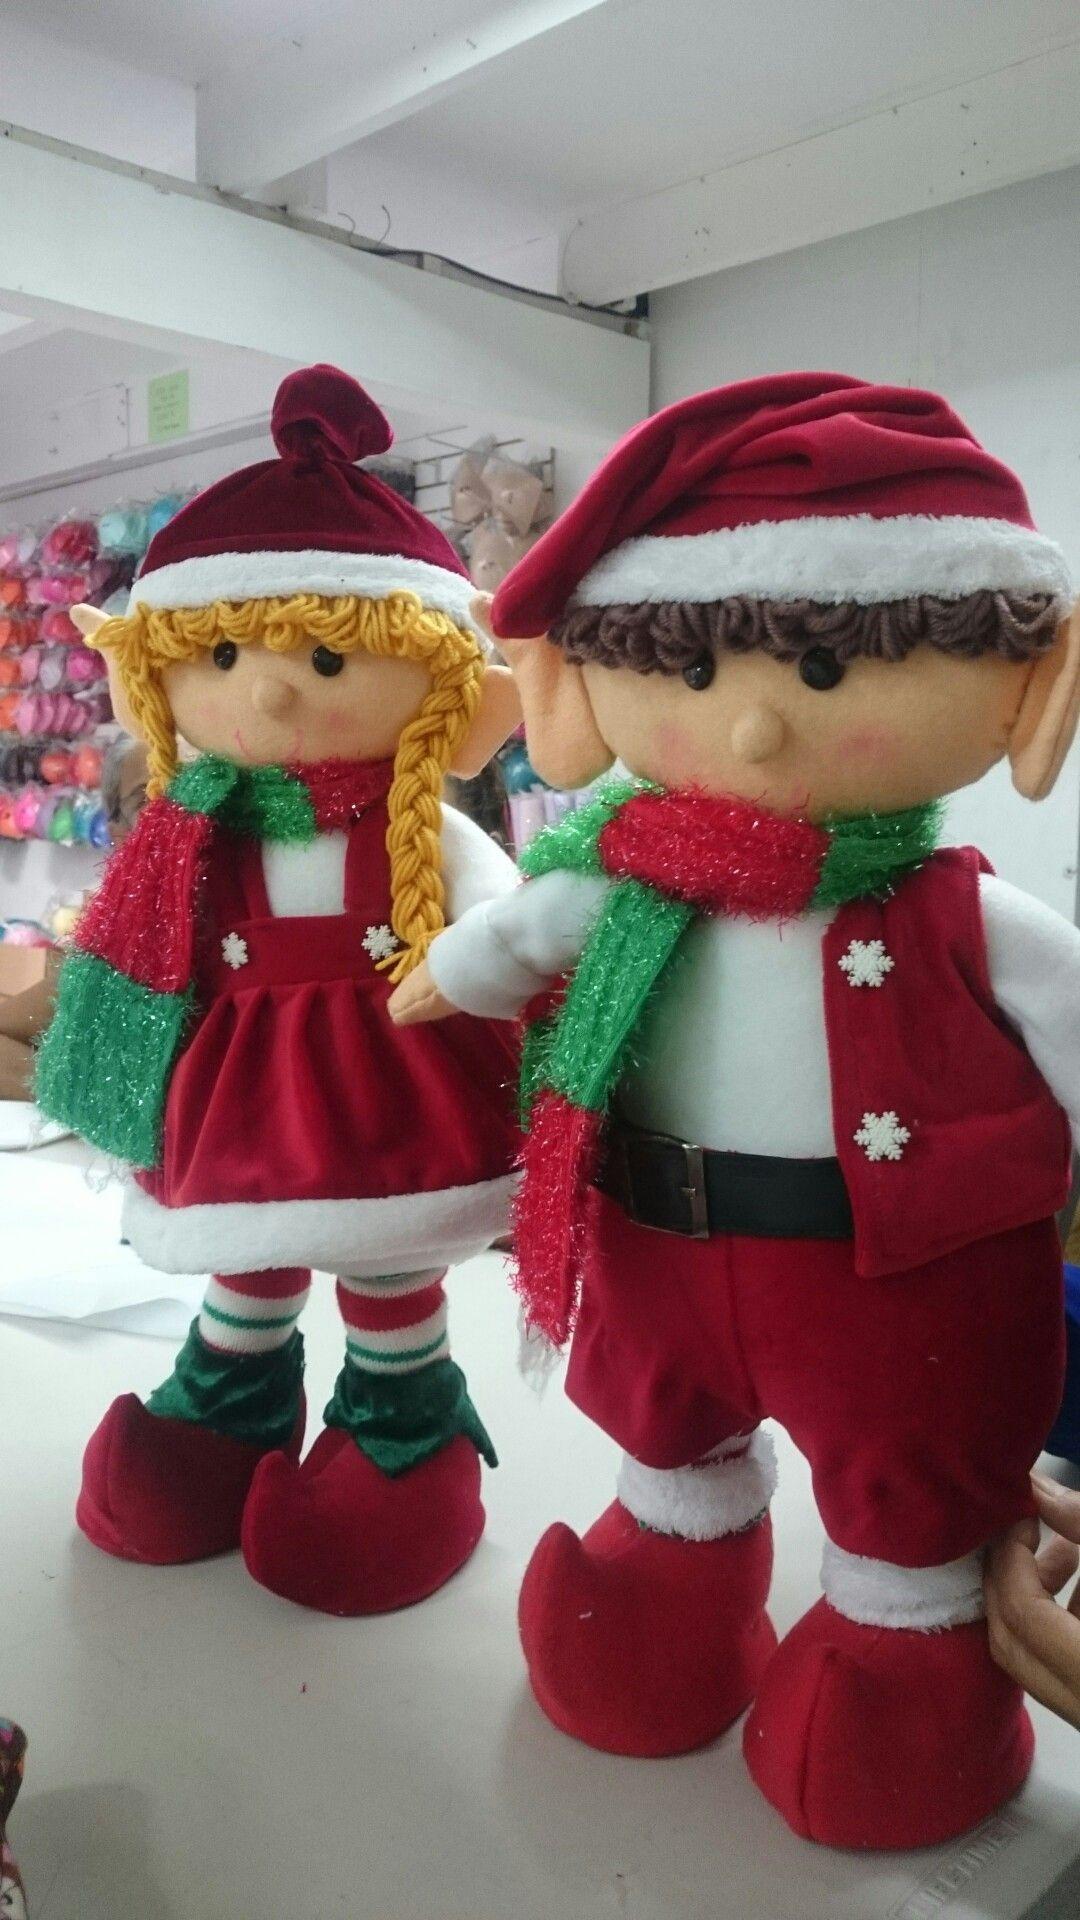 Manualidades Duendes De Navidad.Duendes Navidenos Duendes Manualidades Y Navidad